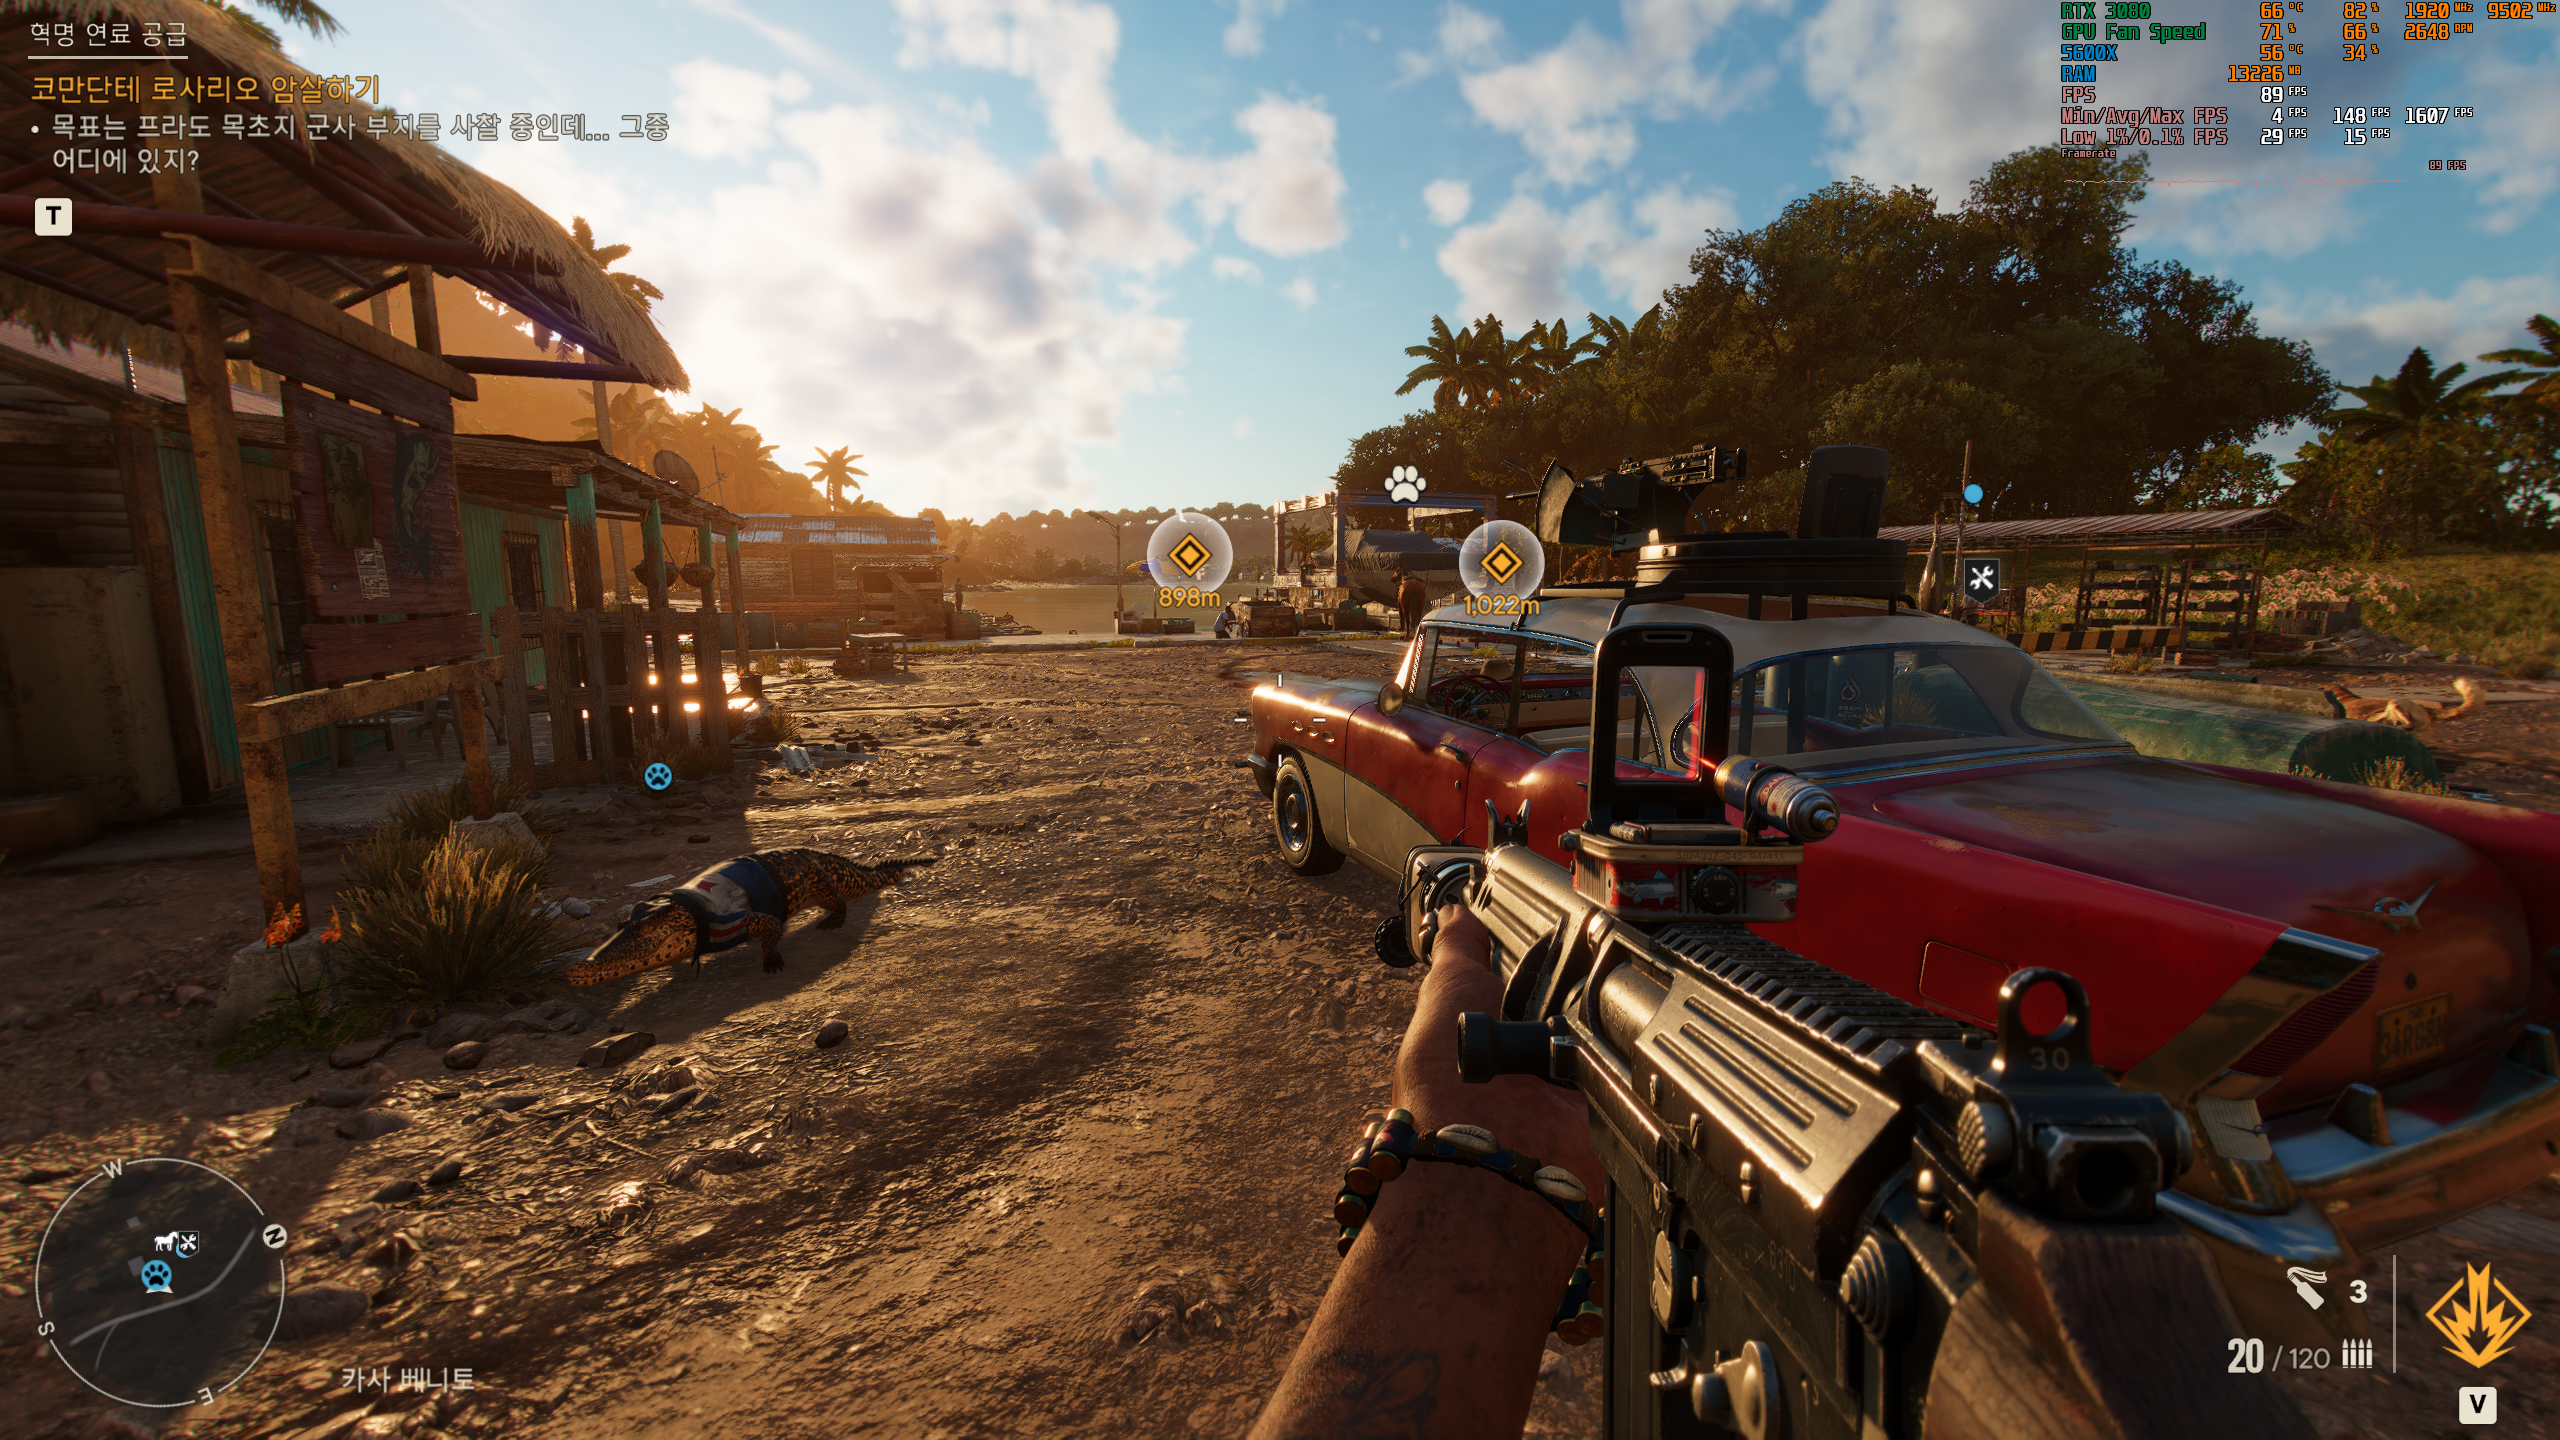 Far Cry 6 Screenshot 2021.10.11 - 03.18.59.58.png